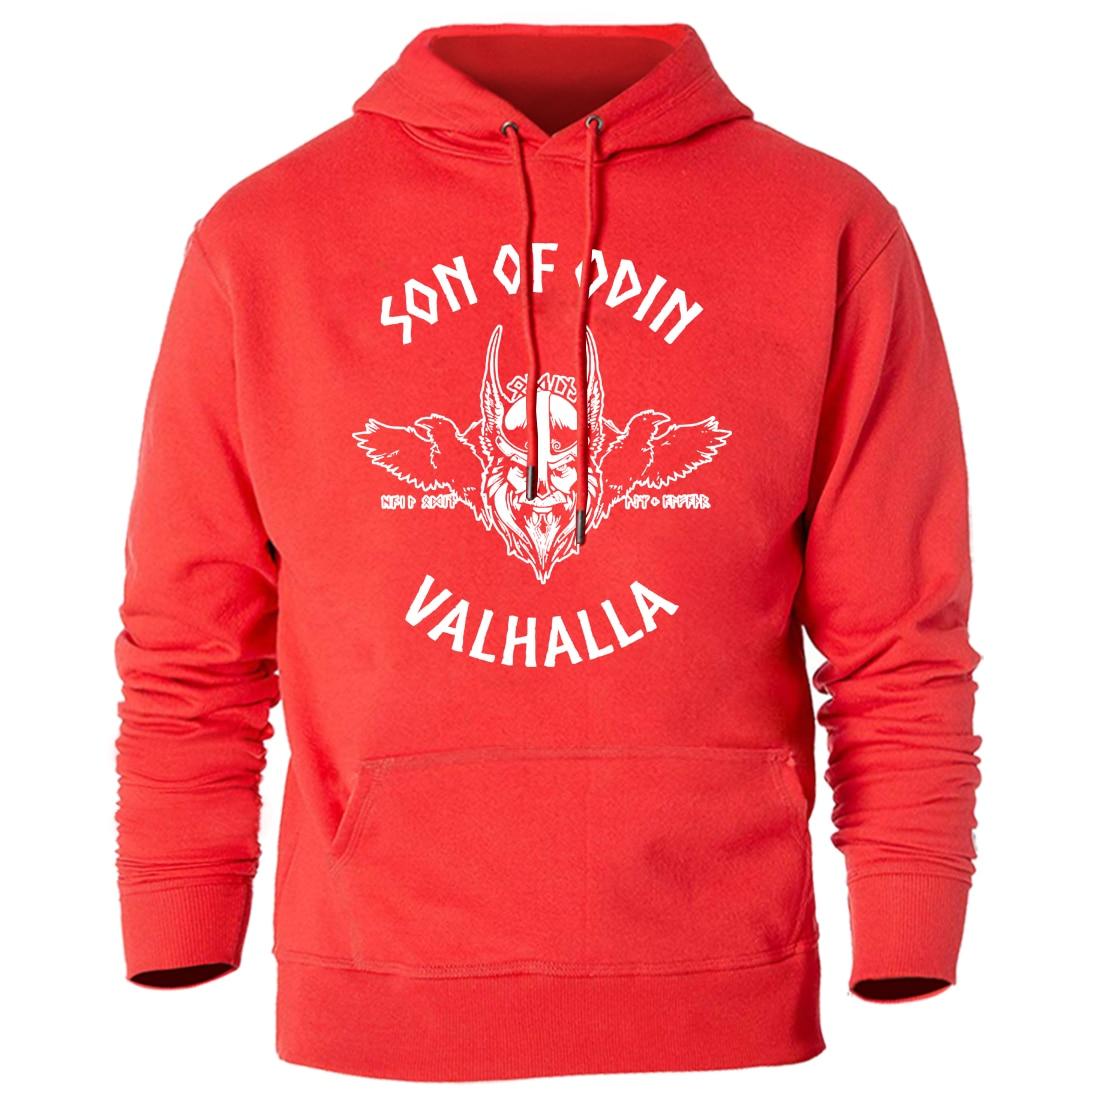 Men Hooded Clothes Vikings Sons Of Odin Sweatshirts 2020 Keep Warm Winter Autumn Hoody Streetwear Casual Hoodies Harajuku Tops